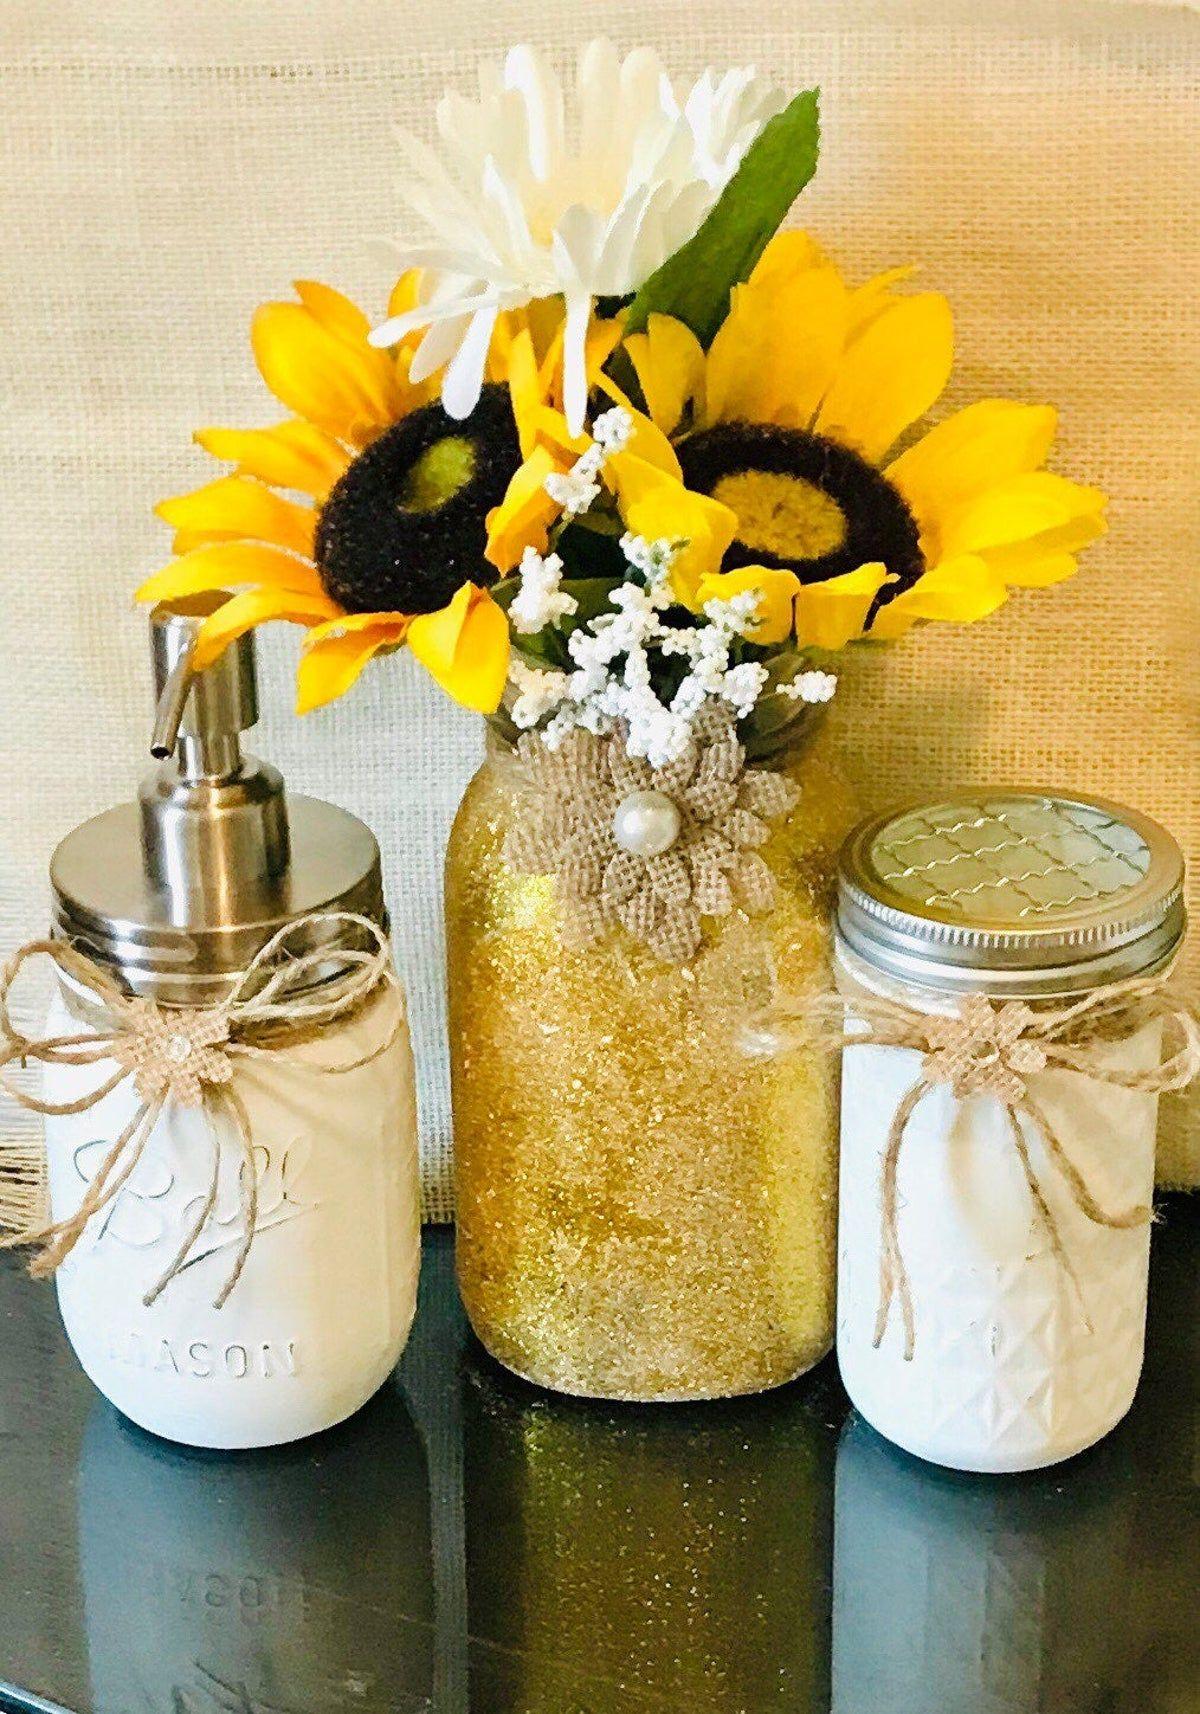 Brightening Sunflowers Bathroom Decor On Mercari In 2020 Sunflower Bathroom Sunflower Home Decor Sunflower Room